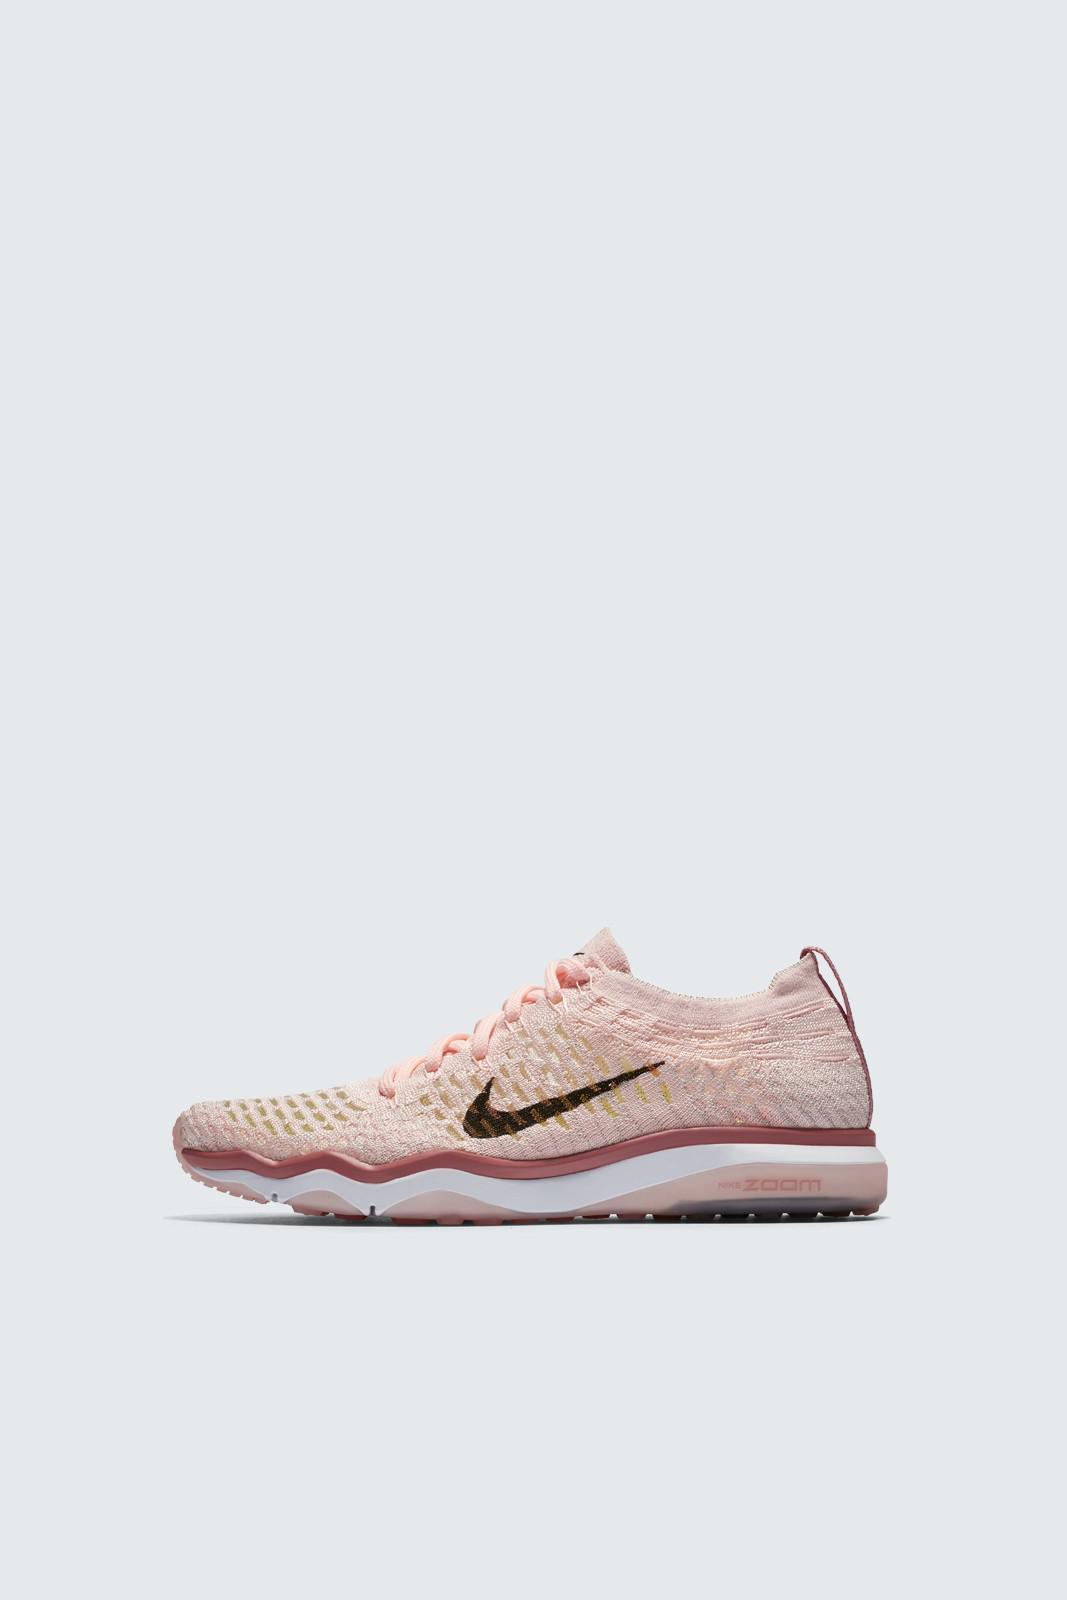 Nike Air Zoom Fearless Flyknit Bionic in Pink - Lyst